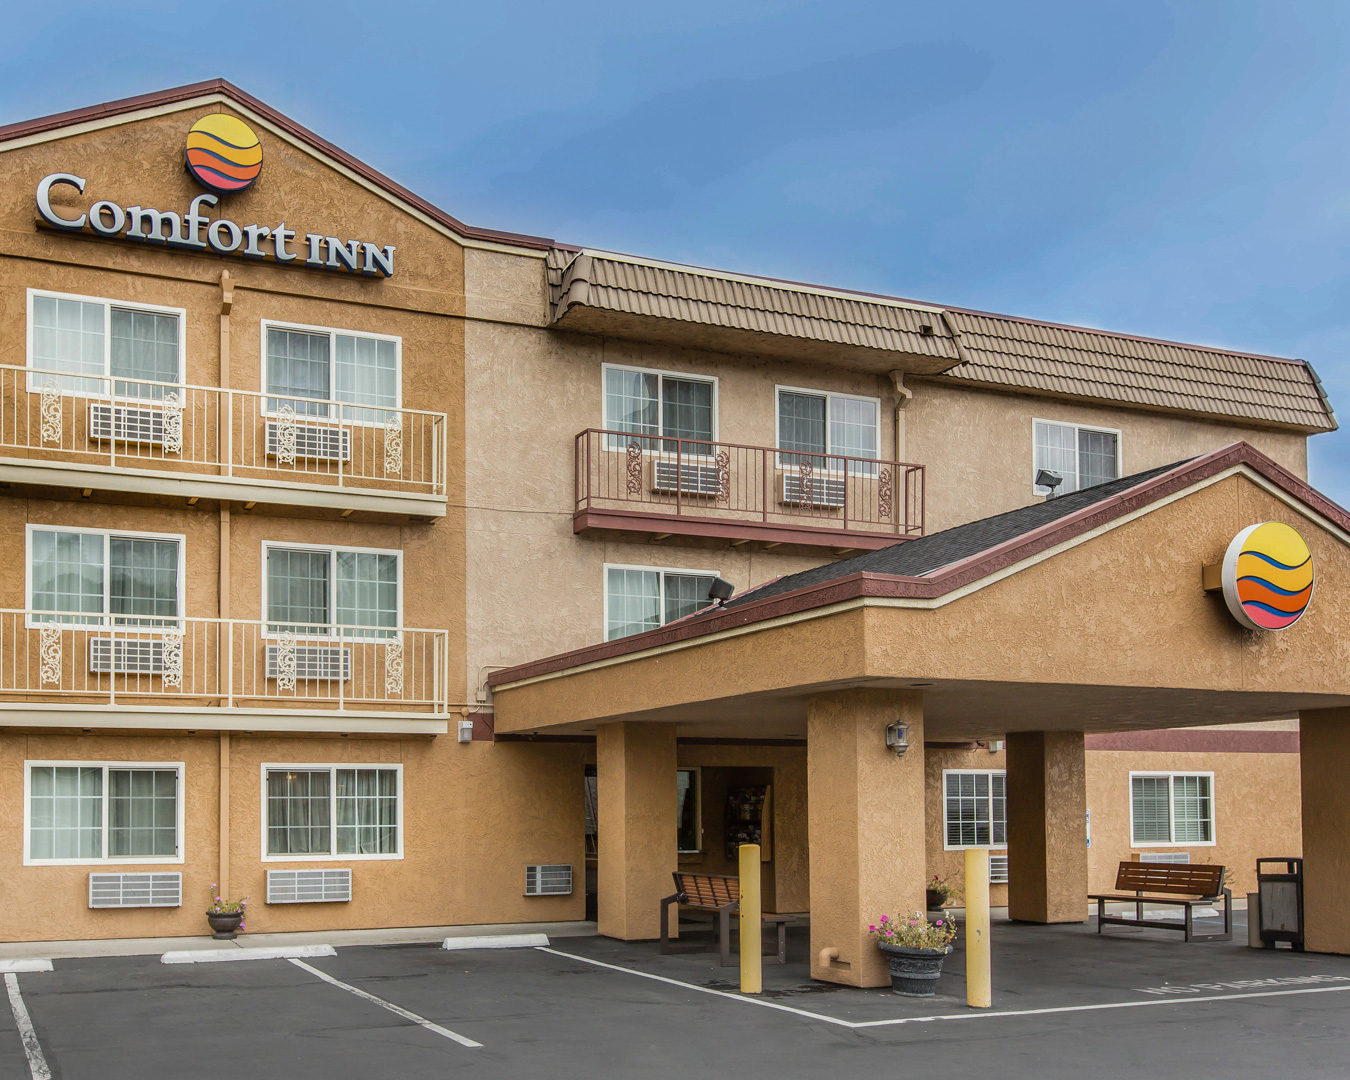 Comfort Inn, Yreka CA